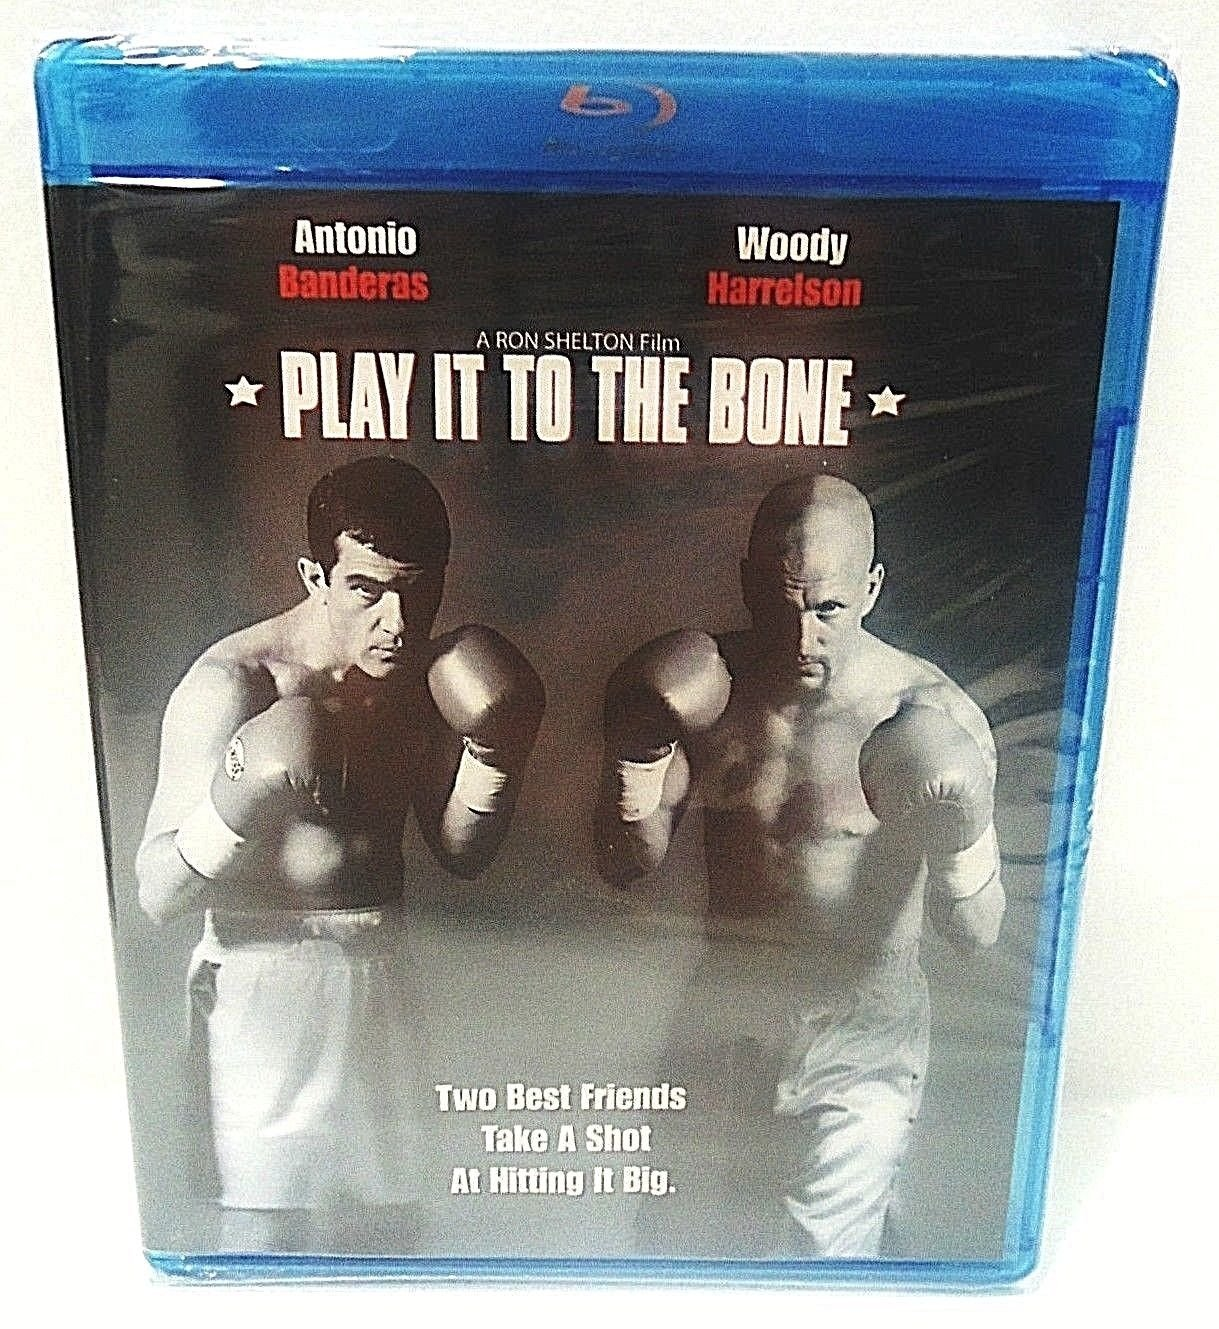 PLAY IT TO THE BONE - DVD - BLU-RAY - WOODY HARRELSON - NEW - SEALED - ROCKY